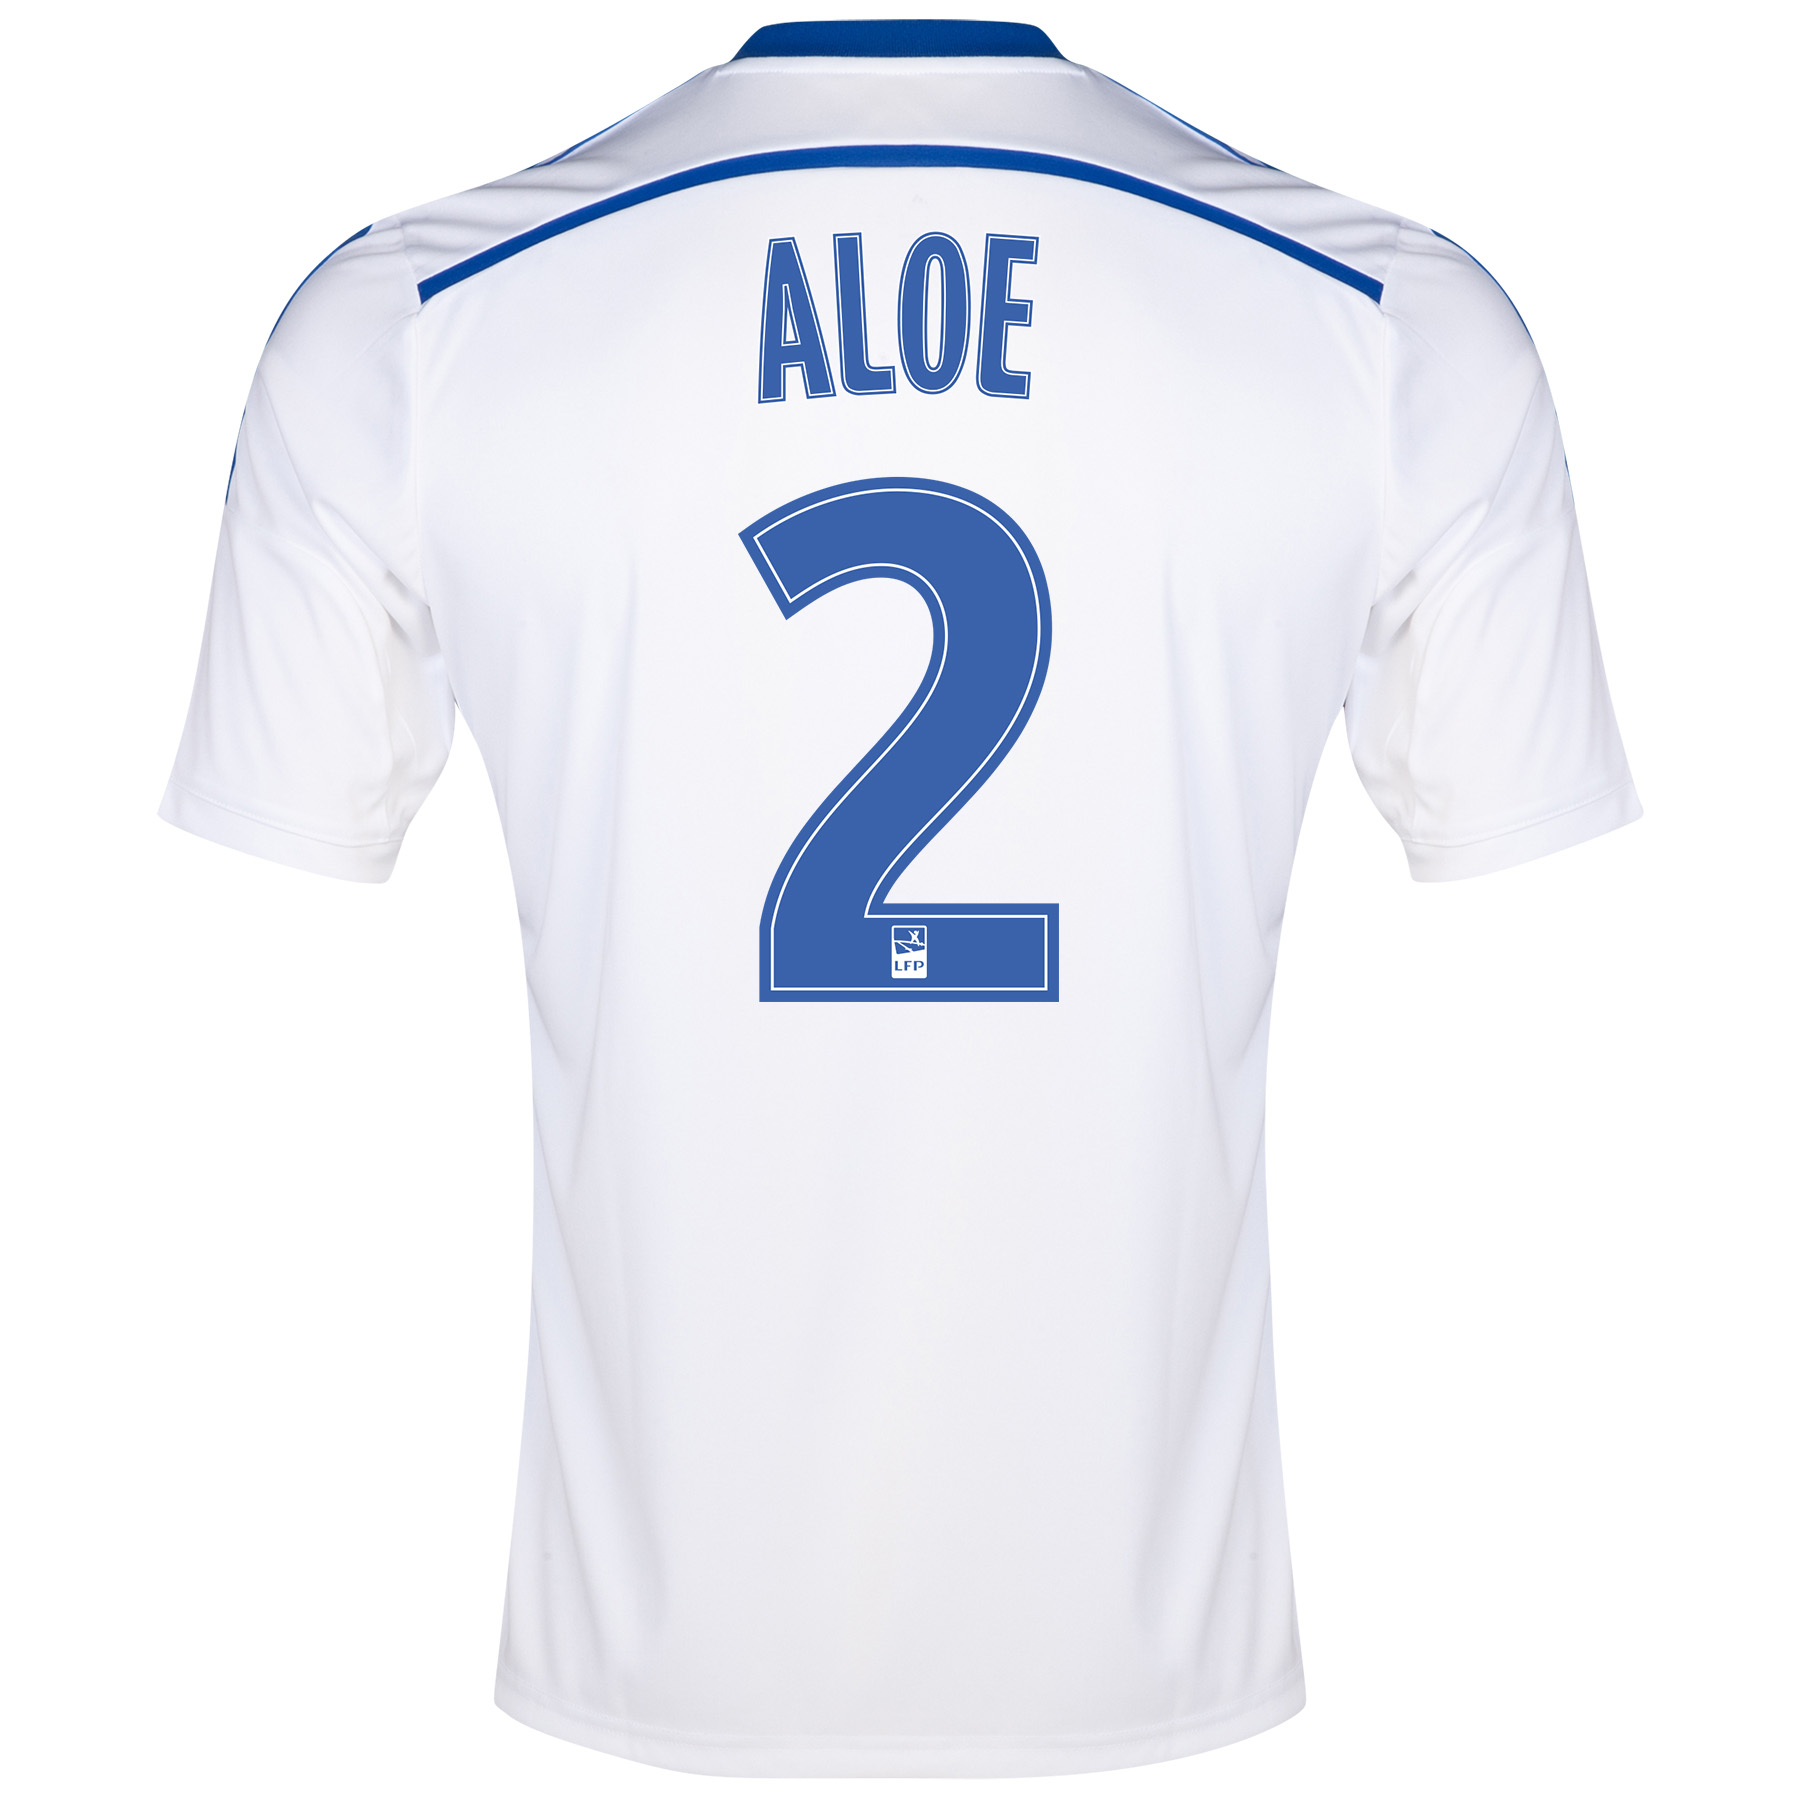 Olympique de Marseille Home Shirt Short Sleeve - Junior 2014/15 White with Aloe 2 printing